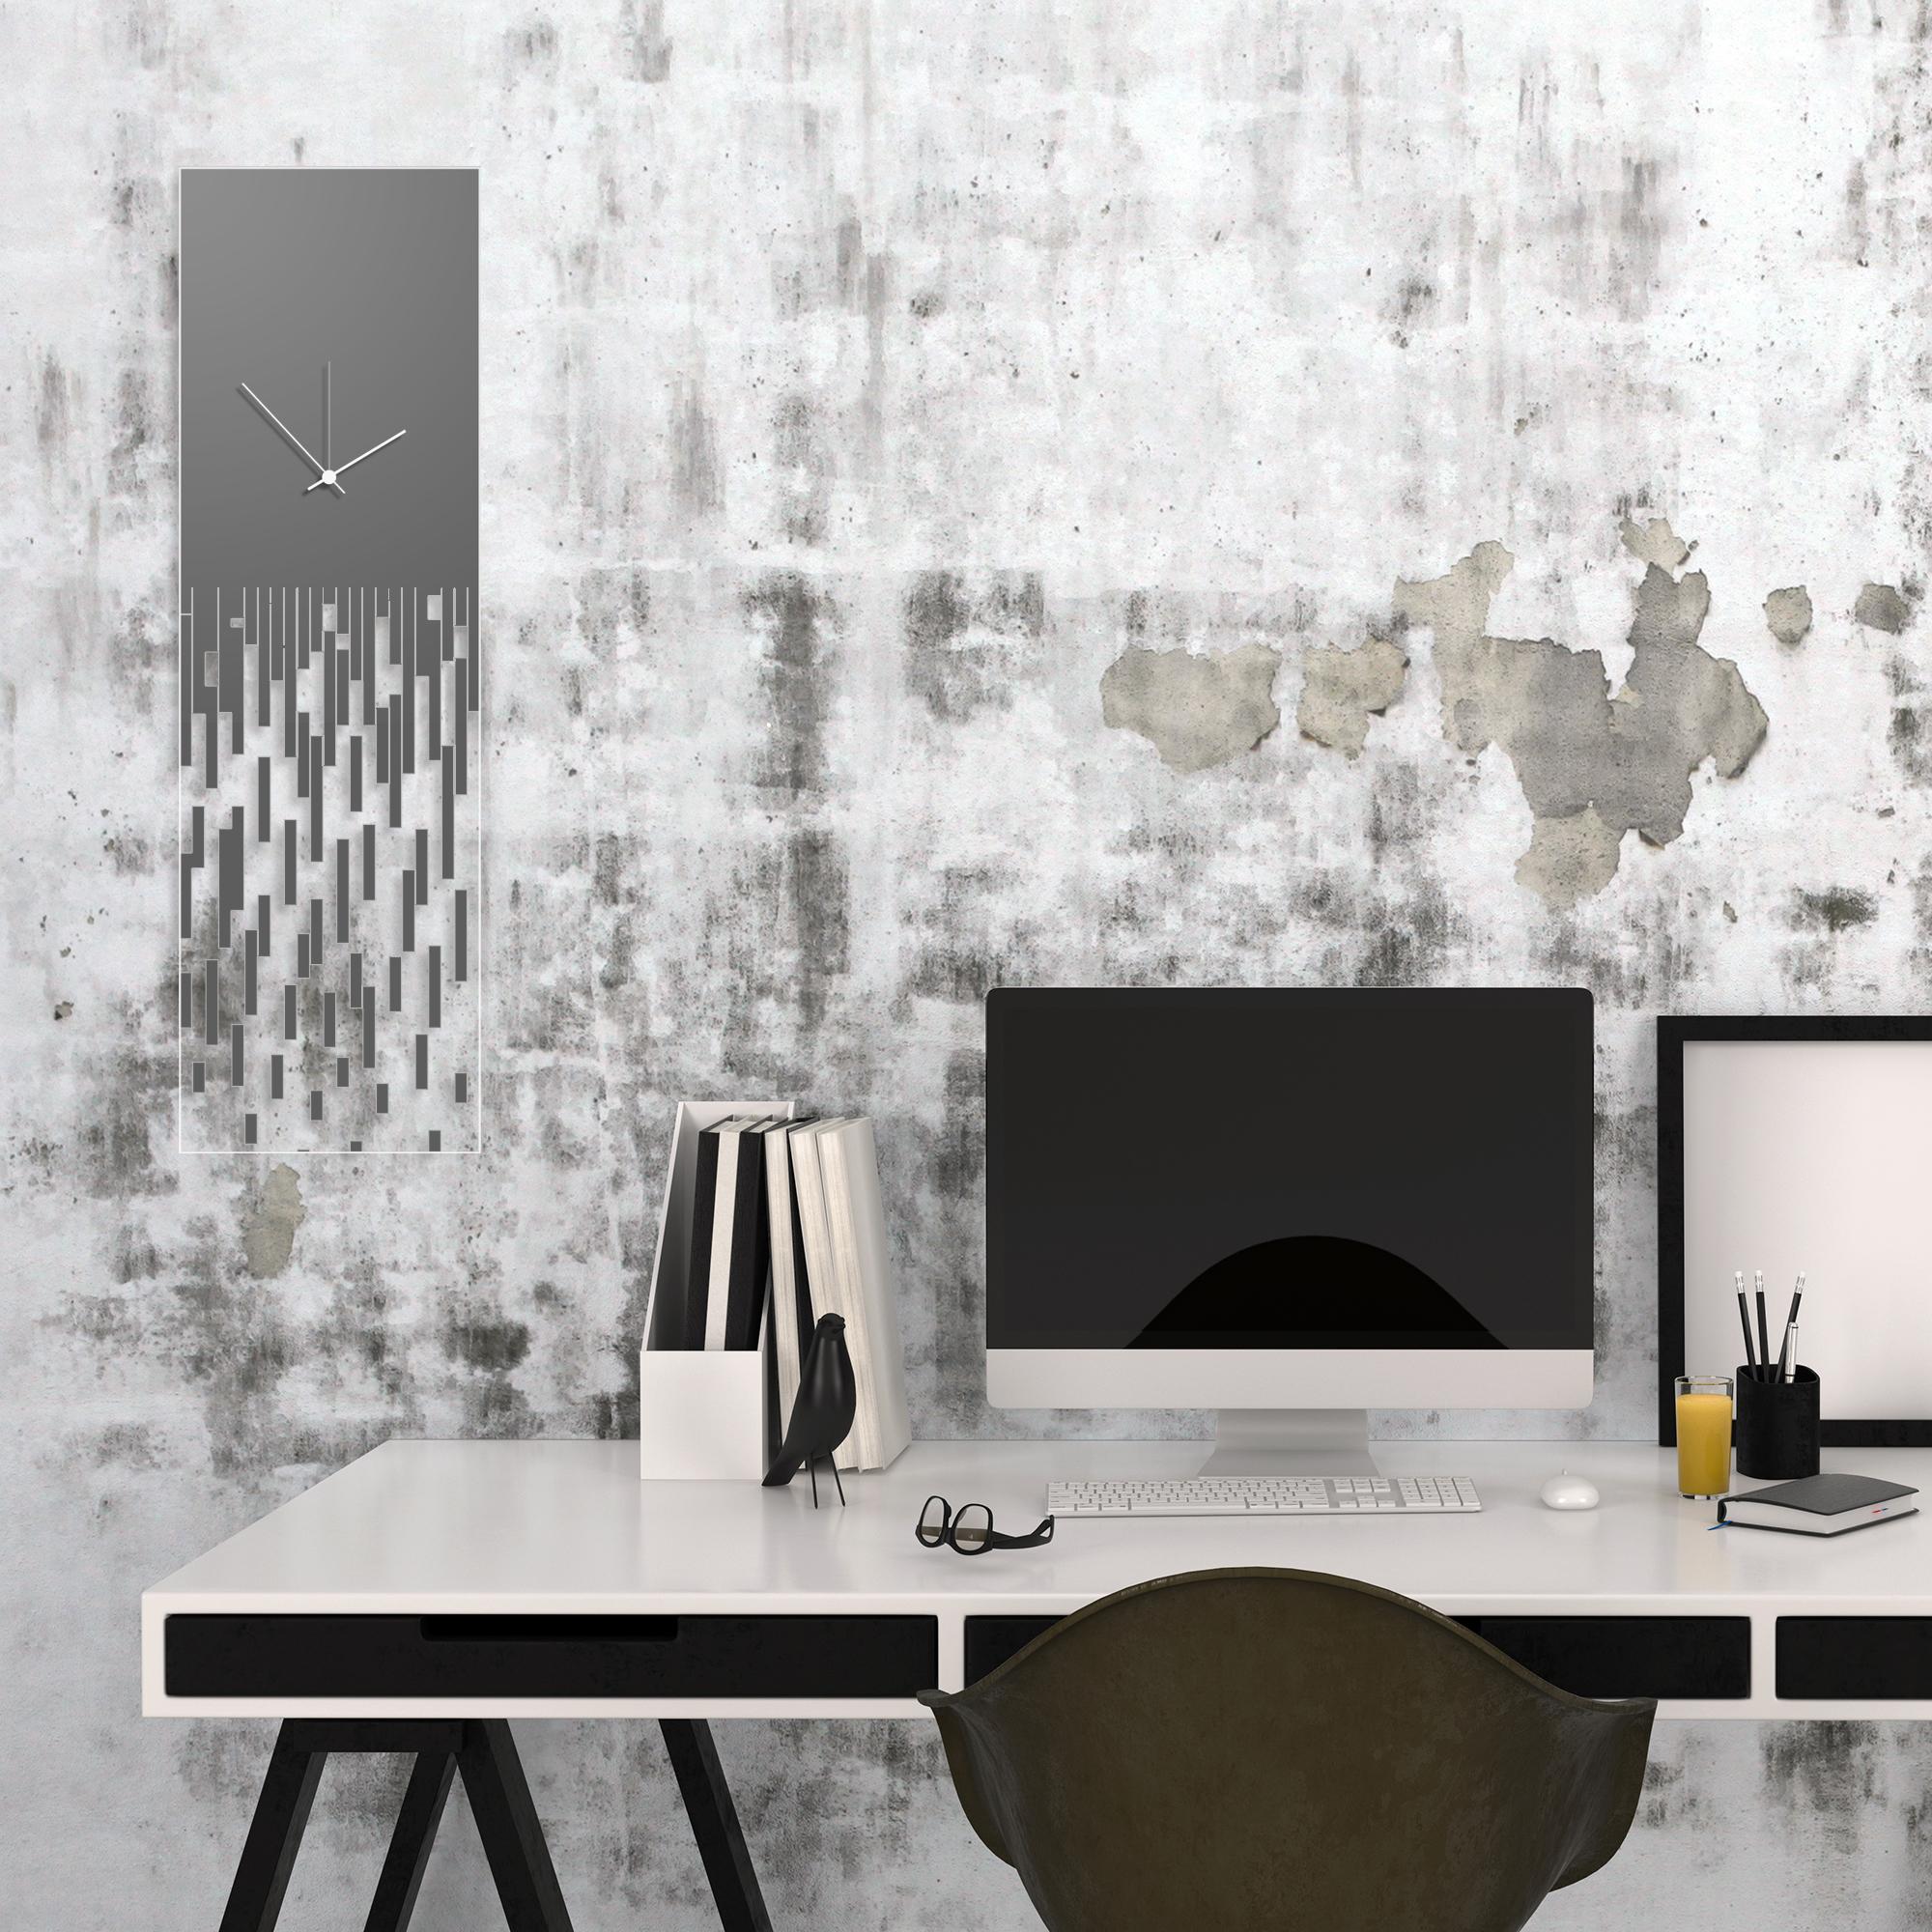 Grey Pixelated Clock by Adam Schwoeppe Surreal Wall Clock on Acrylic - Alternate View 1